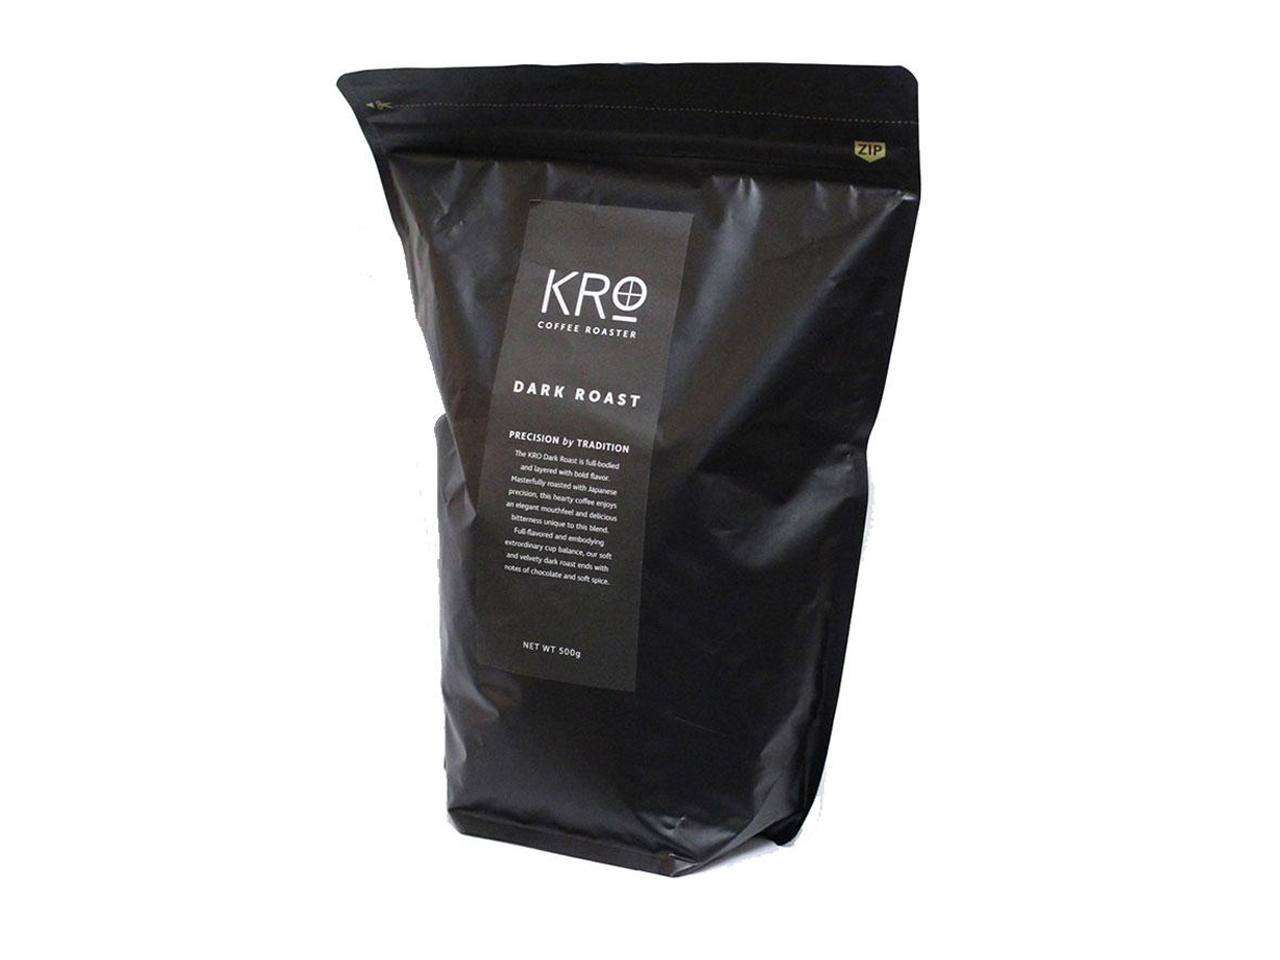 KROプレミアム ダークロースト コーヒー豆  500g